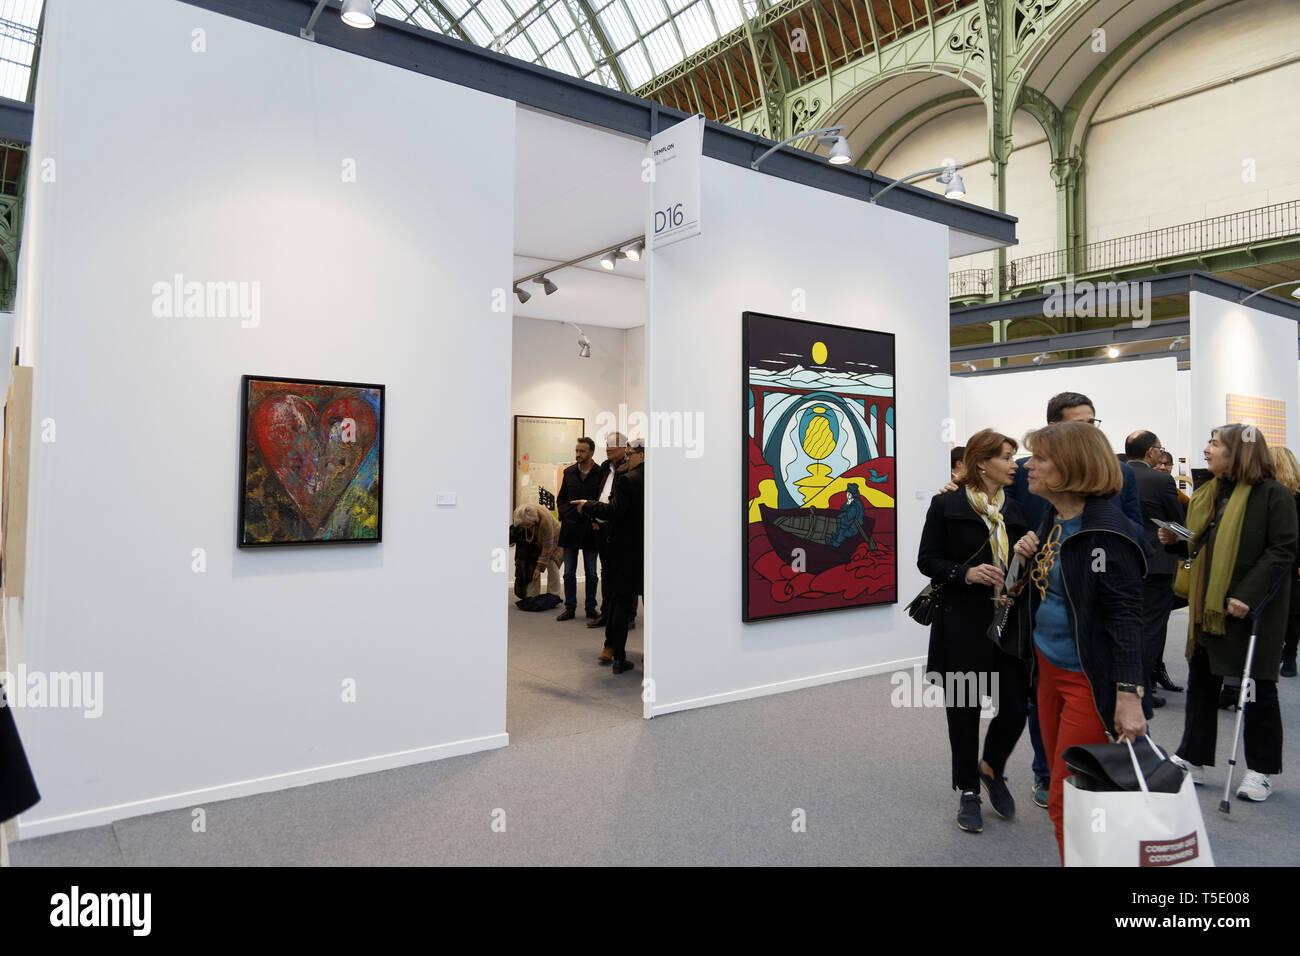 Templon Gallery exibited at Paris Art Fair, Paris, 2019, France. Credit: Veronique Phitoussi/Alamy Stock Photo Stock Photo